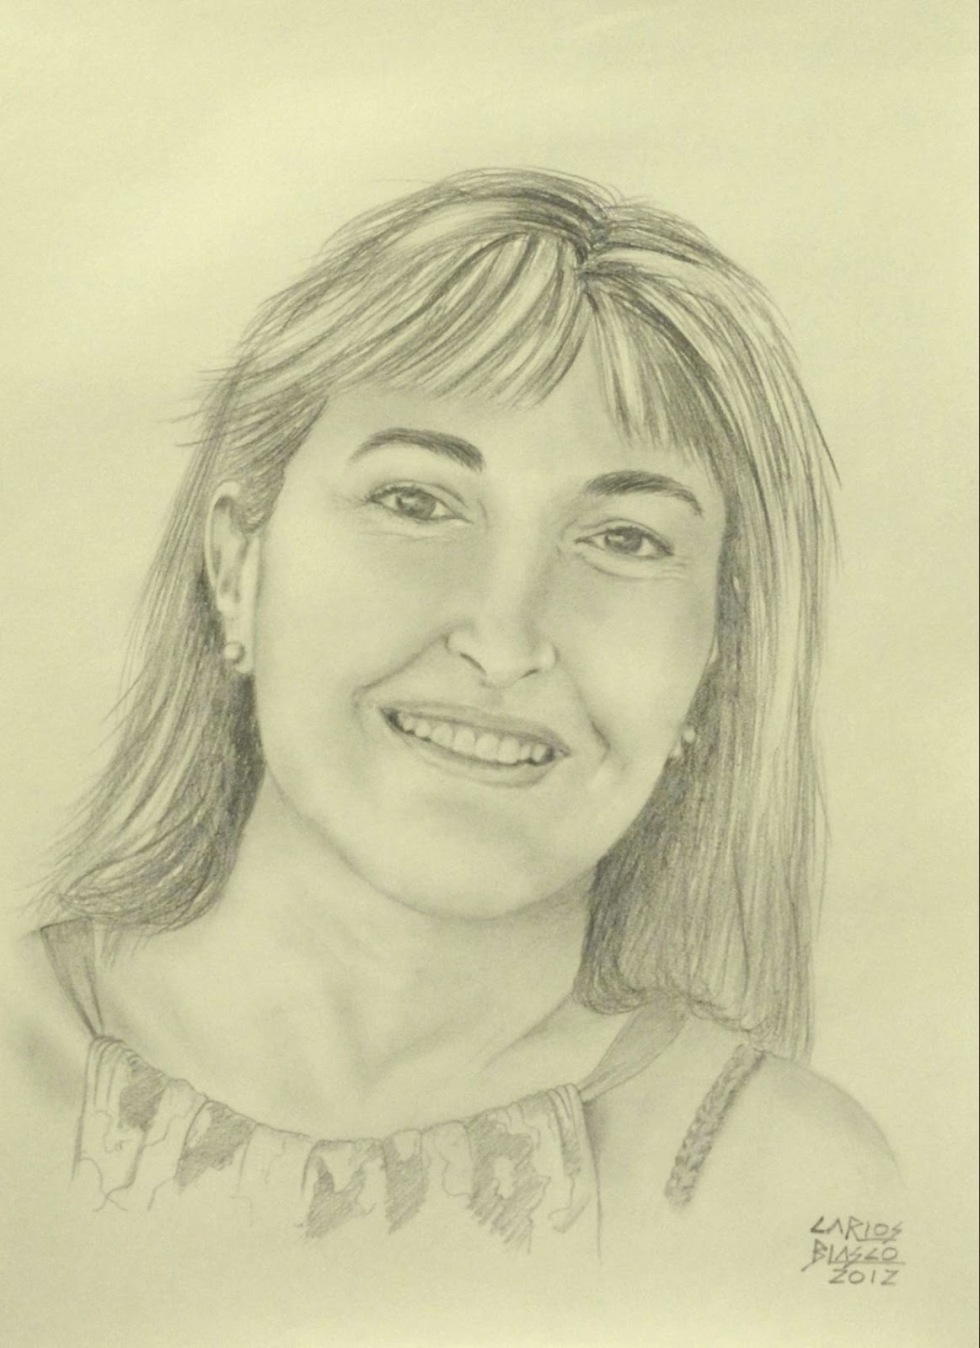 Mª JOSÉ-Grafito sobre papel-42x29 cms.